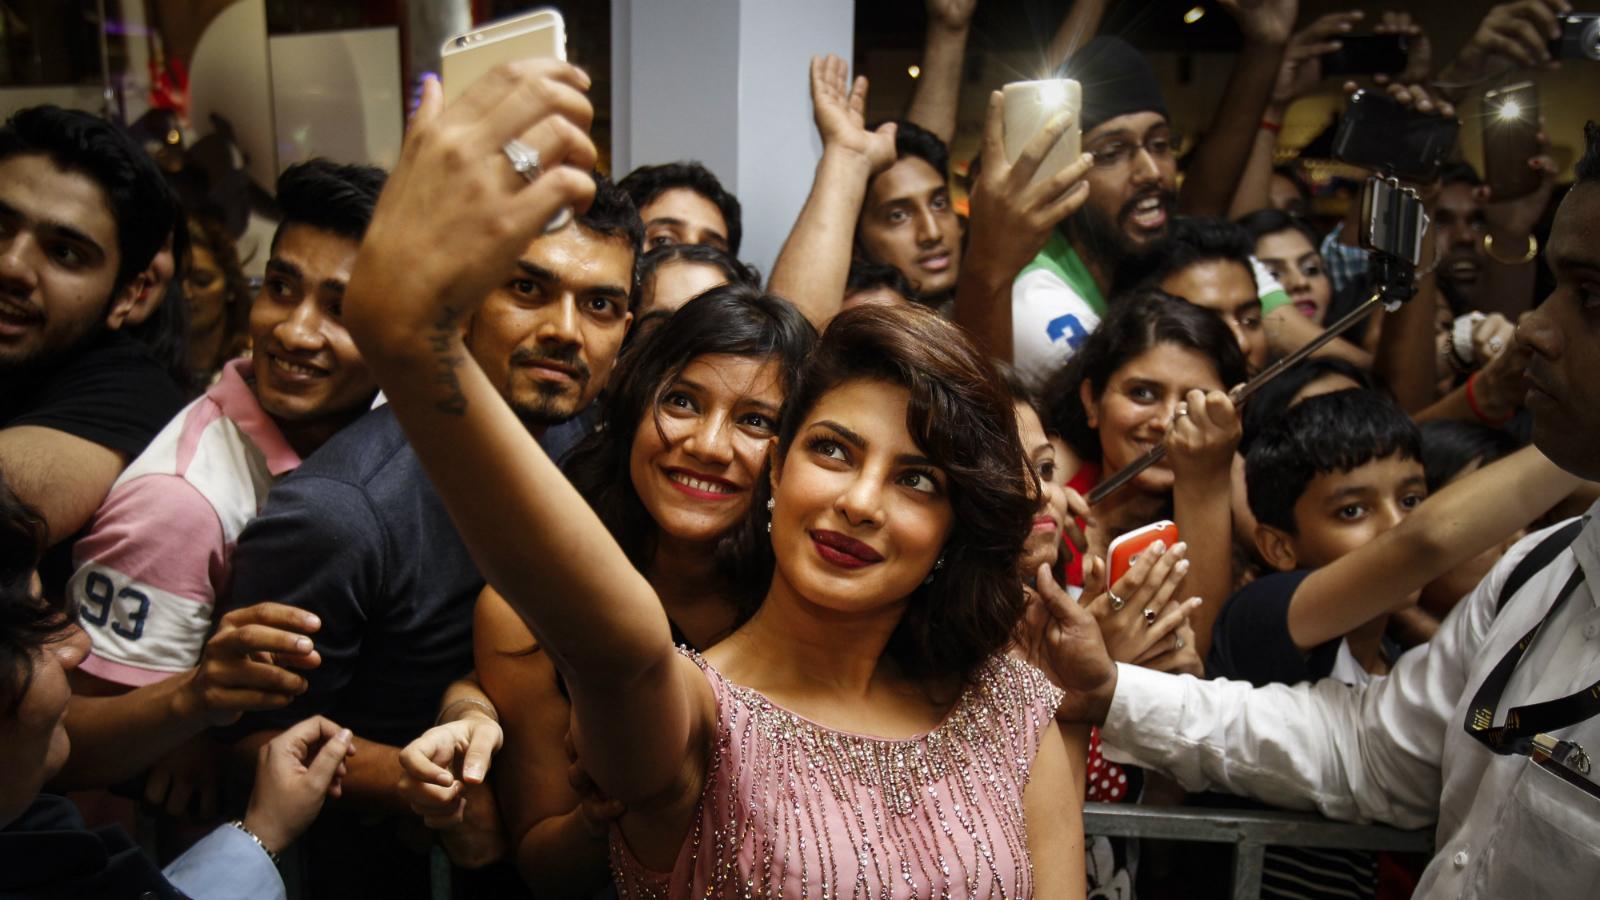 Bollywood actress Priyanka Chopra, center, has a selfie photo taken with fans during the IIFA Gala Screening as part of the three-day long International Indian Film Academy (IIFA) awards held in Kuala Lumpur, Malaysia, Saturday, June 6, 2015. The 16th IIFA is scheduled for June 5-7 in Malaysia. (AP Photo/Joshua Paul)